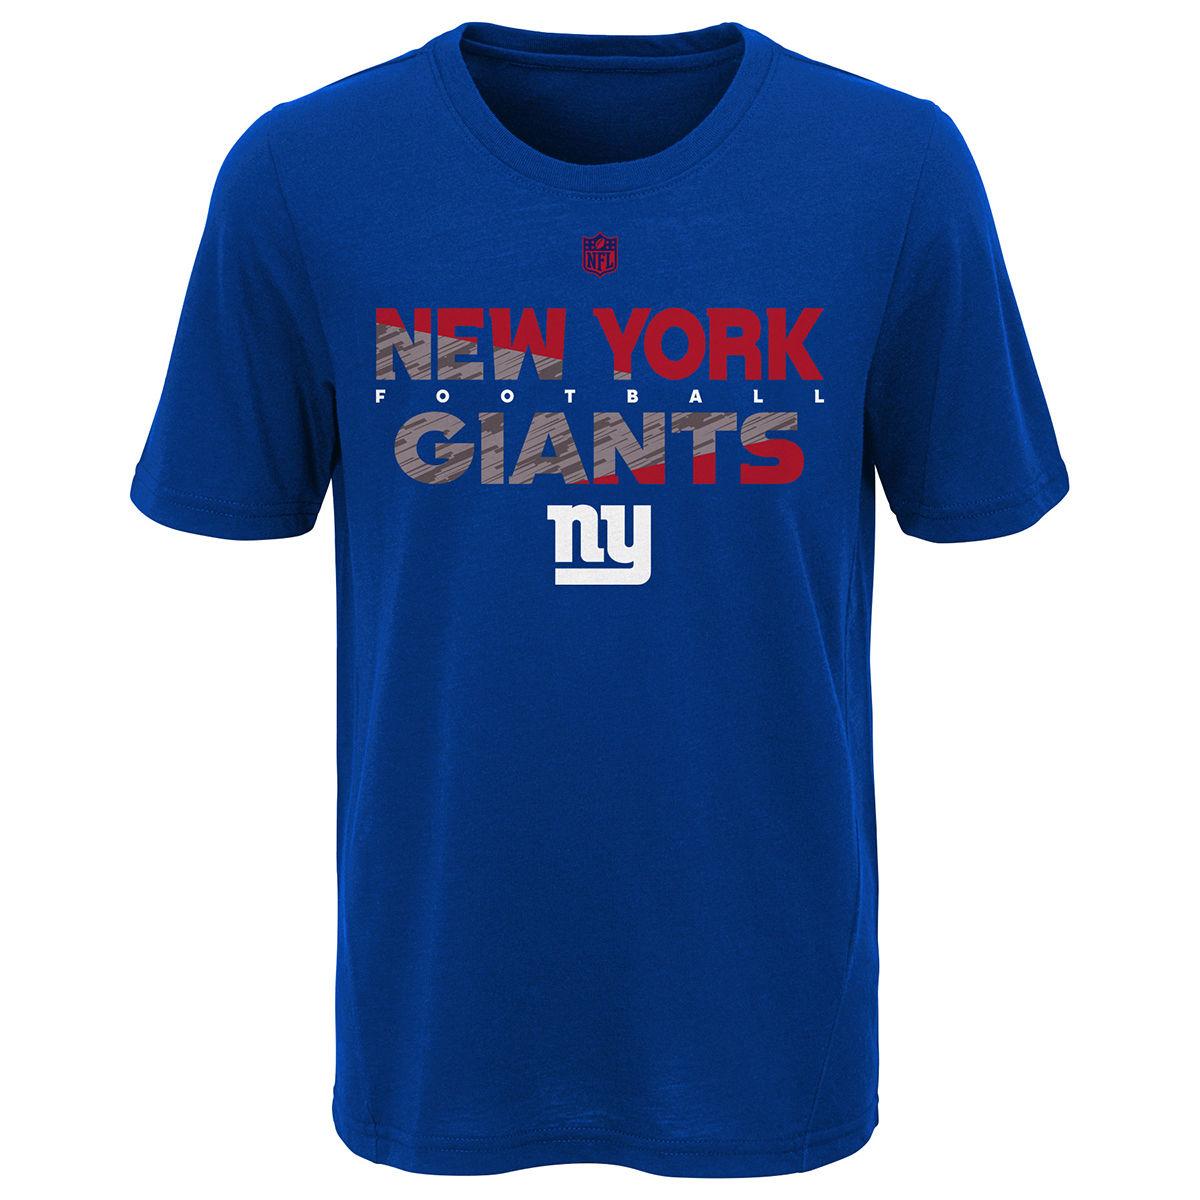 New York Giants Big Boys' Flux Dual Blend Short-Sleeve Tee - Blue, XL